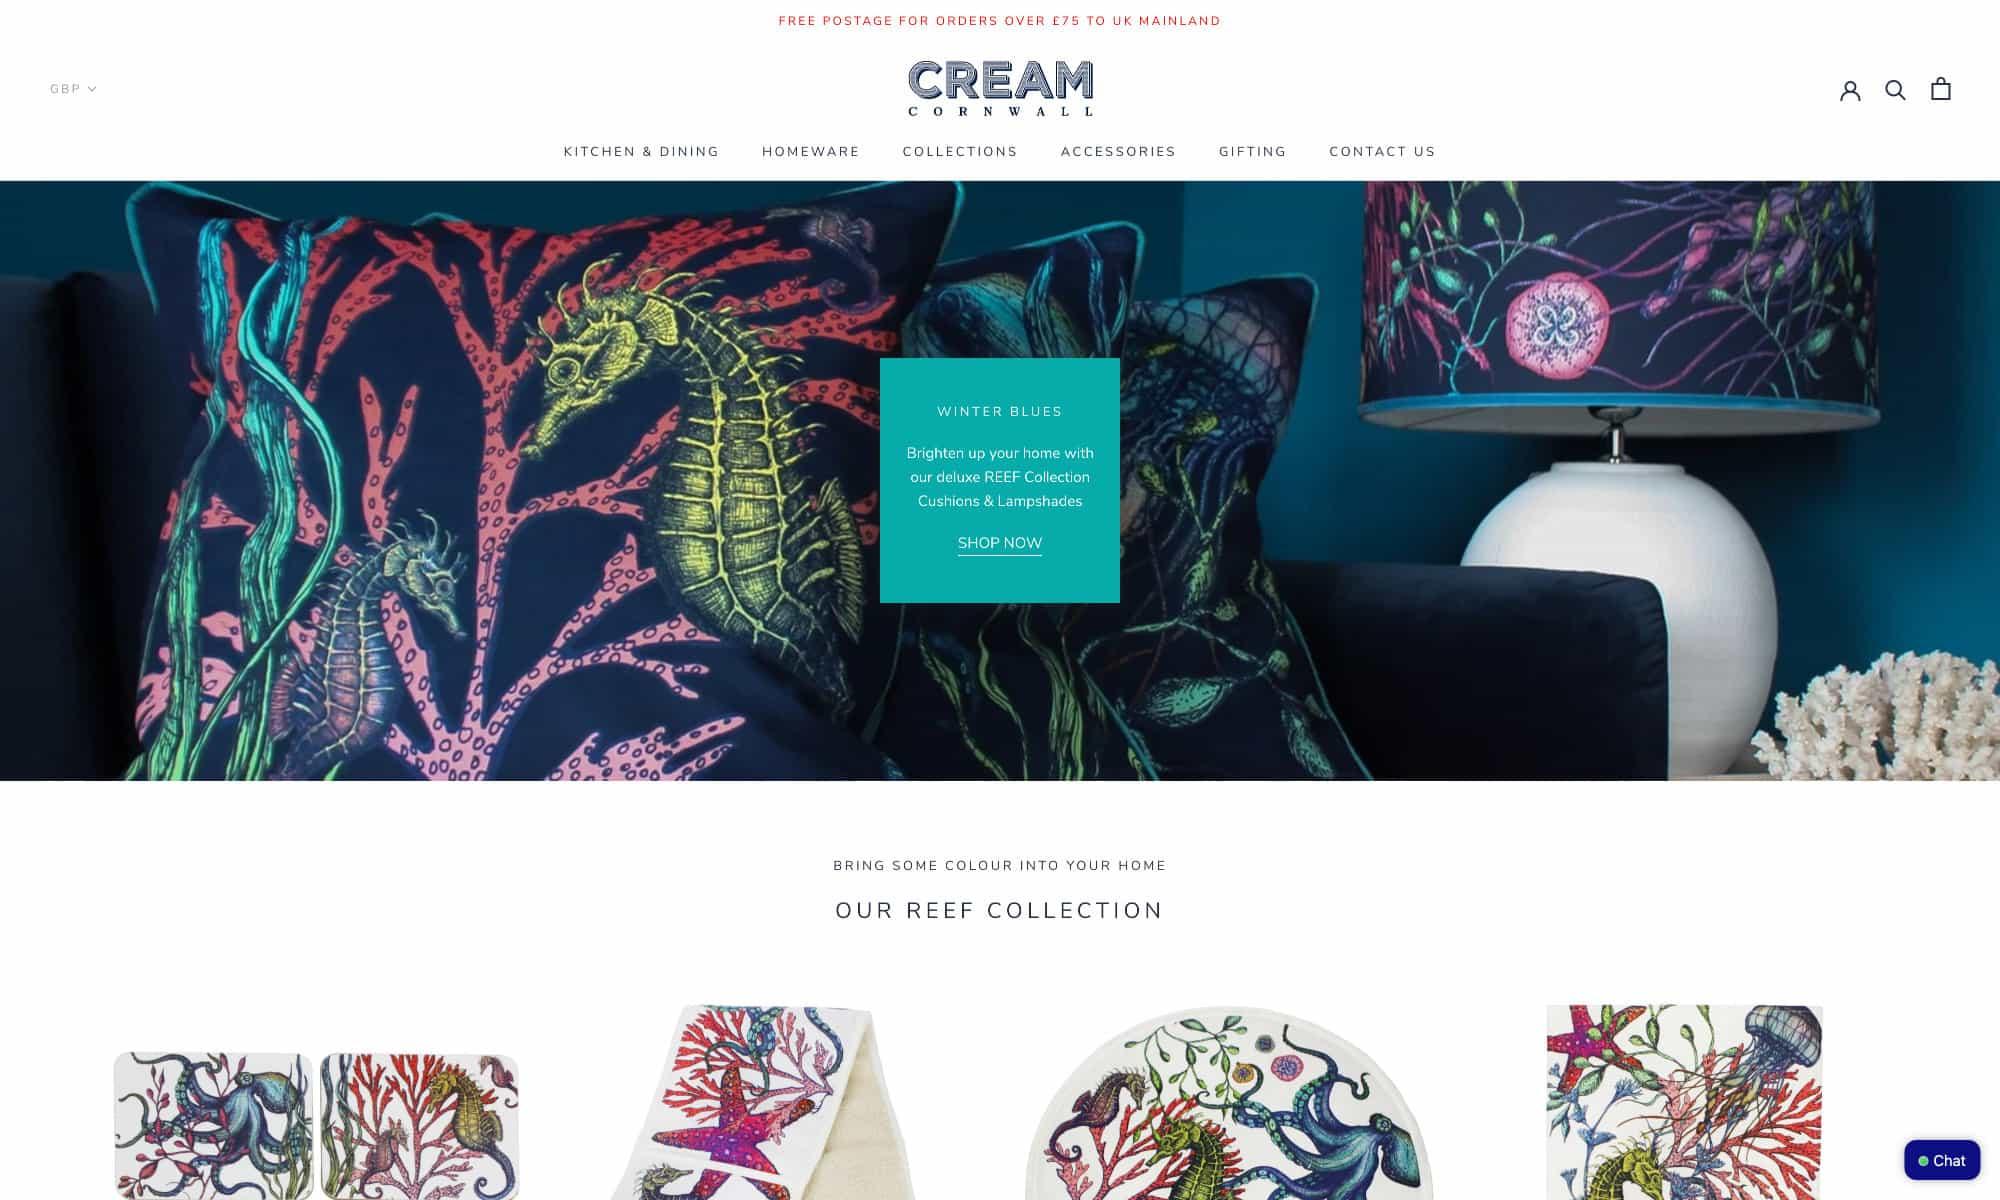 Cream Cornwall